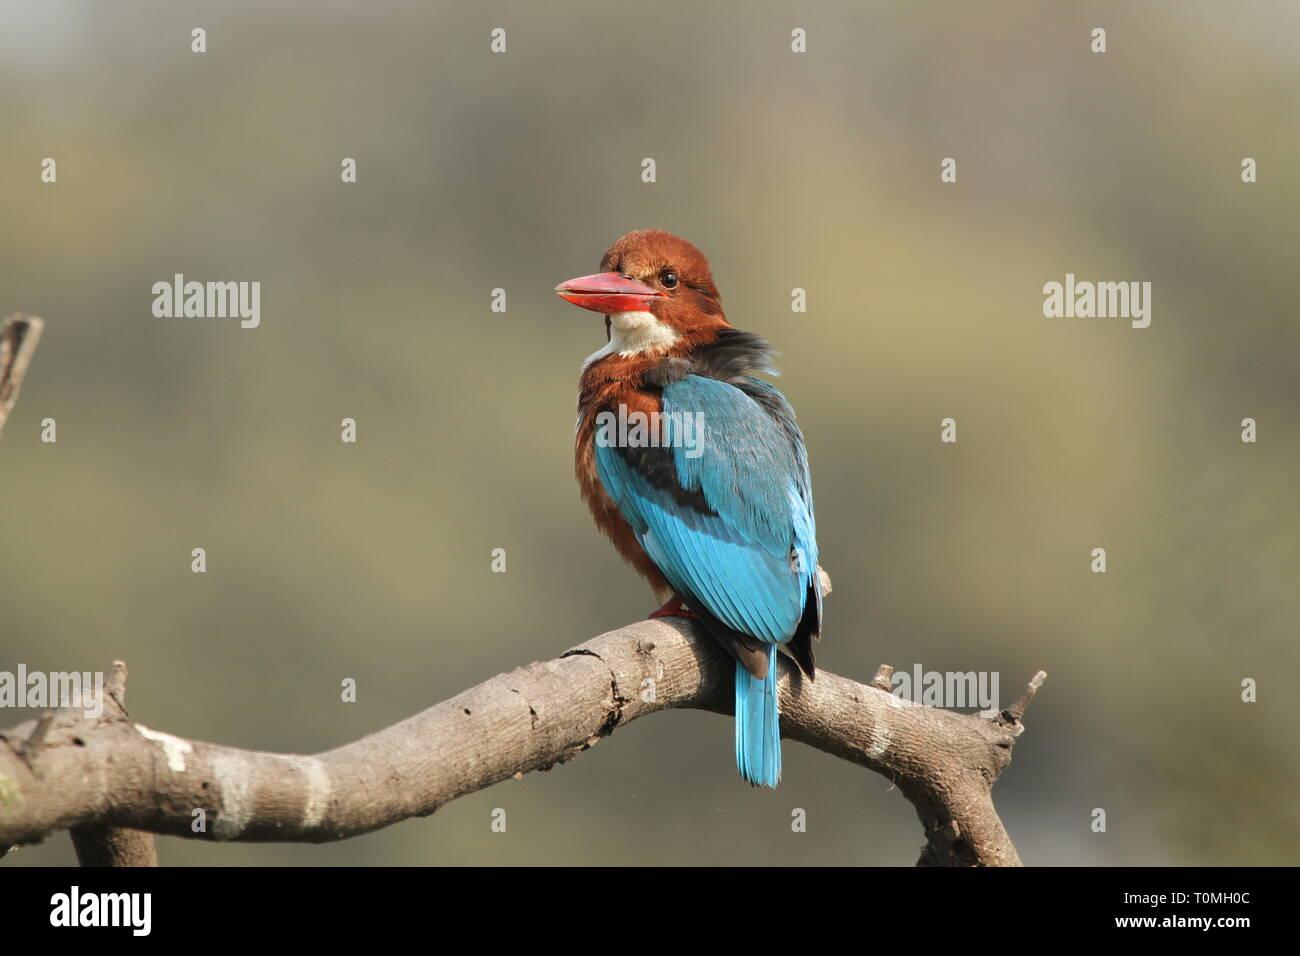 White-throated kingfisher on tree - Stock Image